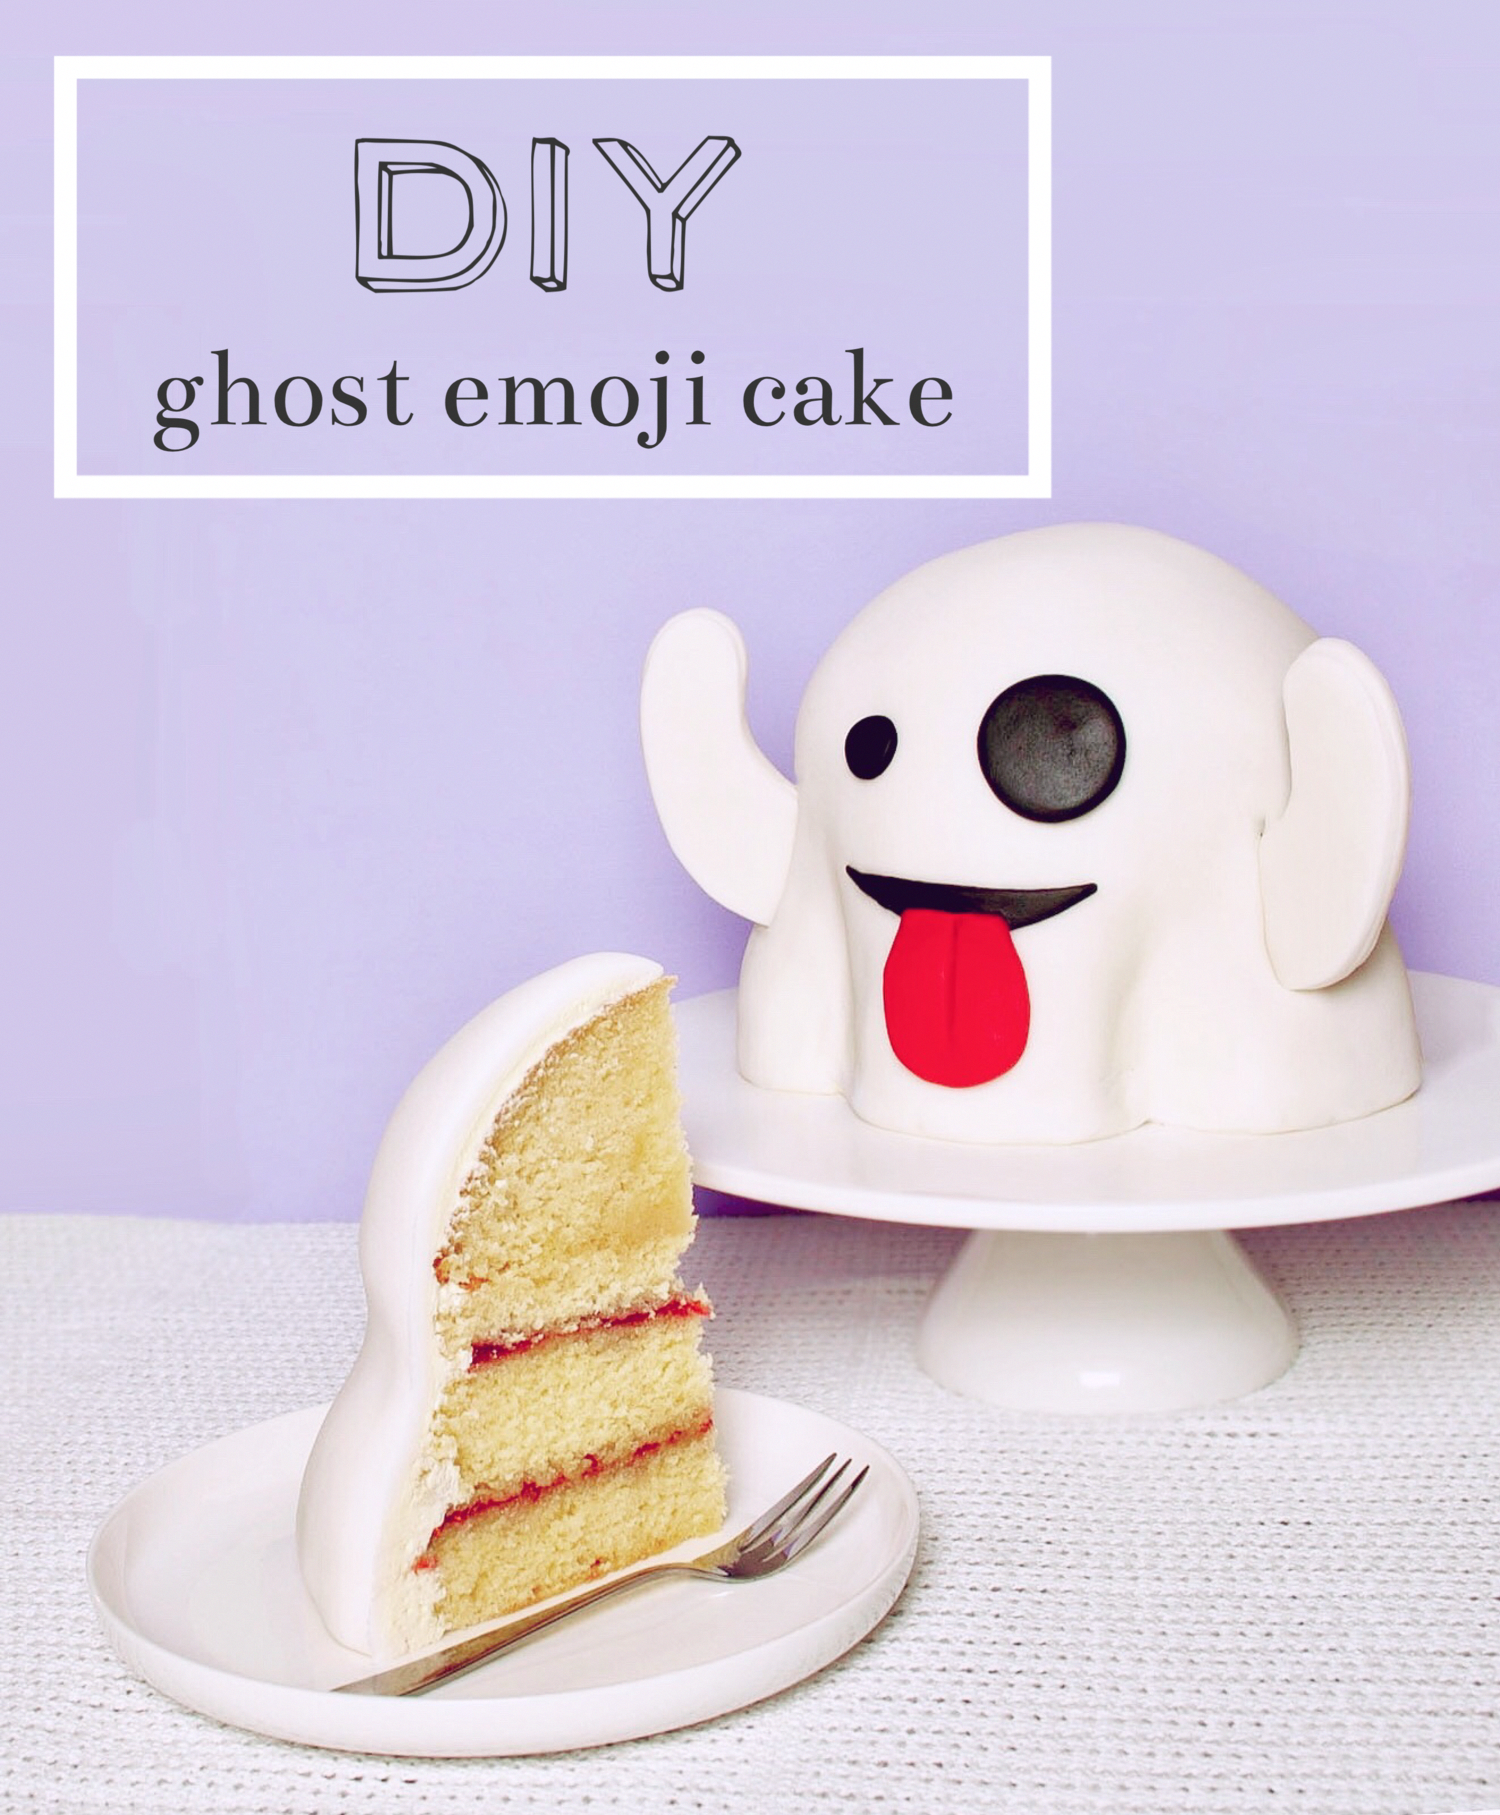 Celebrate Halloween With This Fun Ghost Emoji Cake So Cute Halloween Hallowe Cake Celebrate Cute Emoji Fun Ghost Hal Emoji Cake Cake Savoury Cake